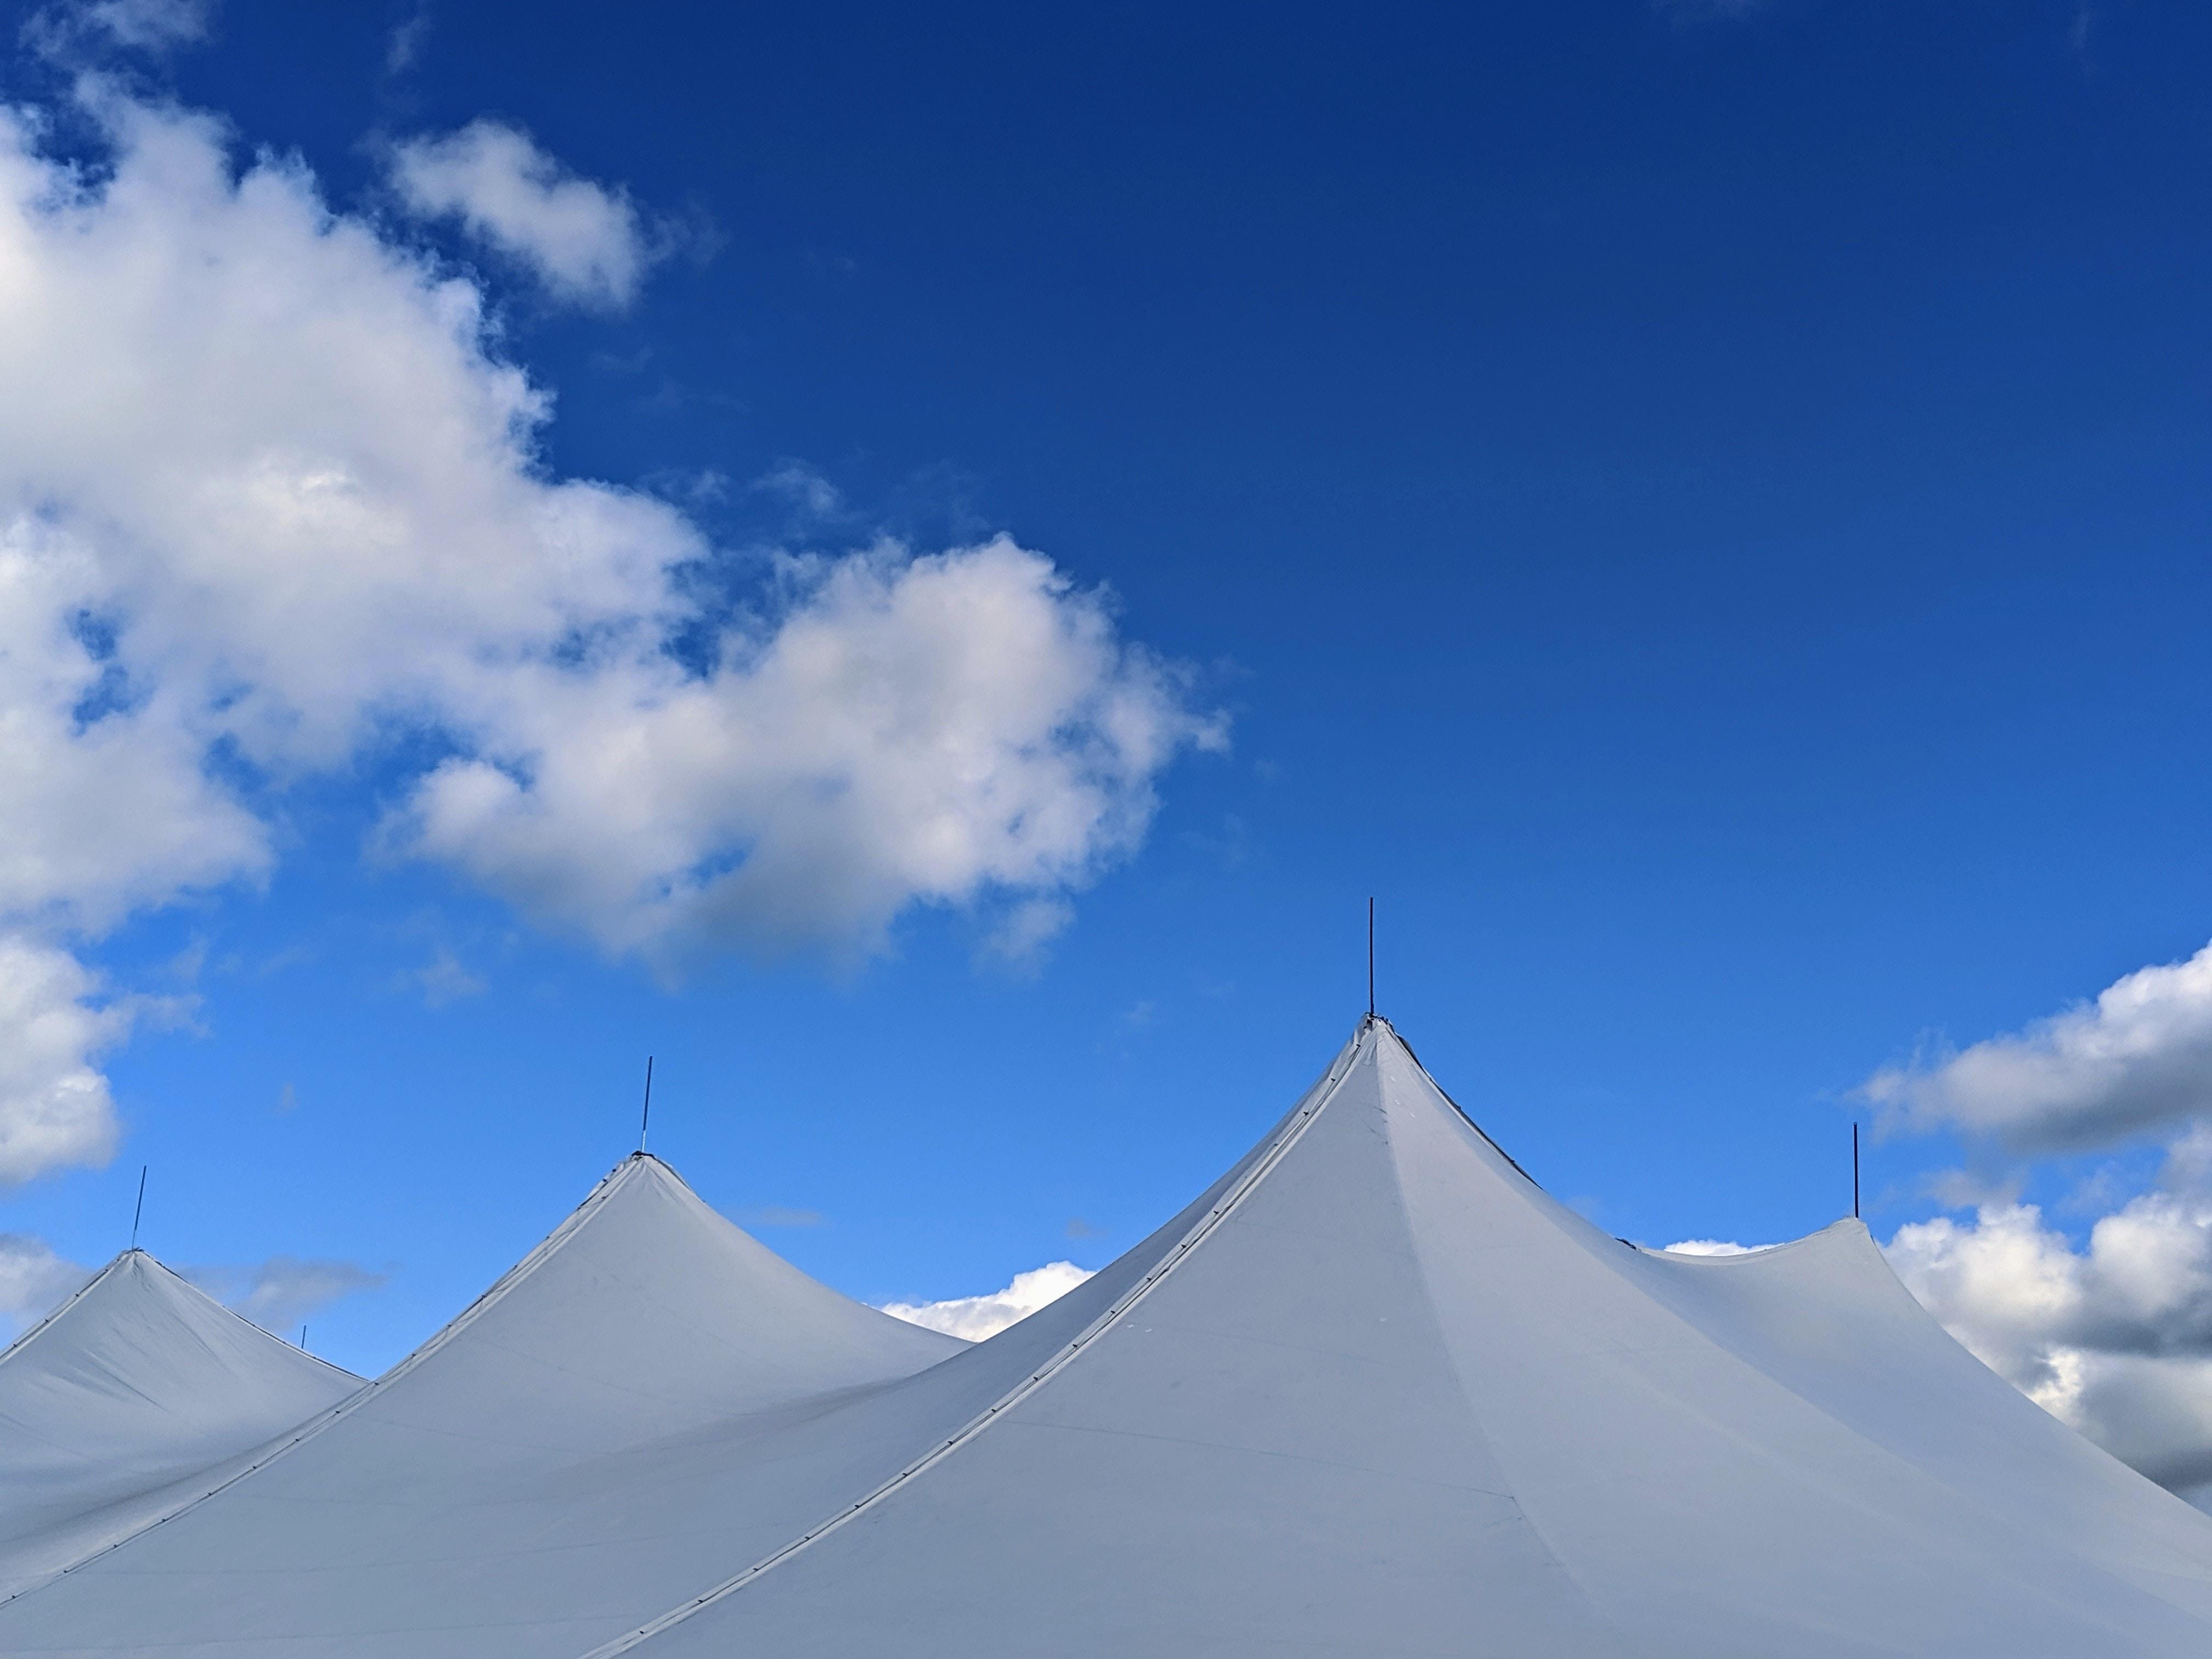 UNICEF, Unicef-telte, telte, telt, super-telte. (Foto: Unsplash)